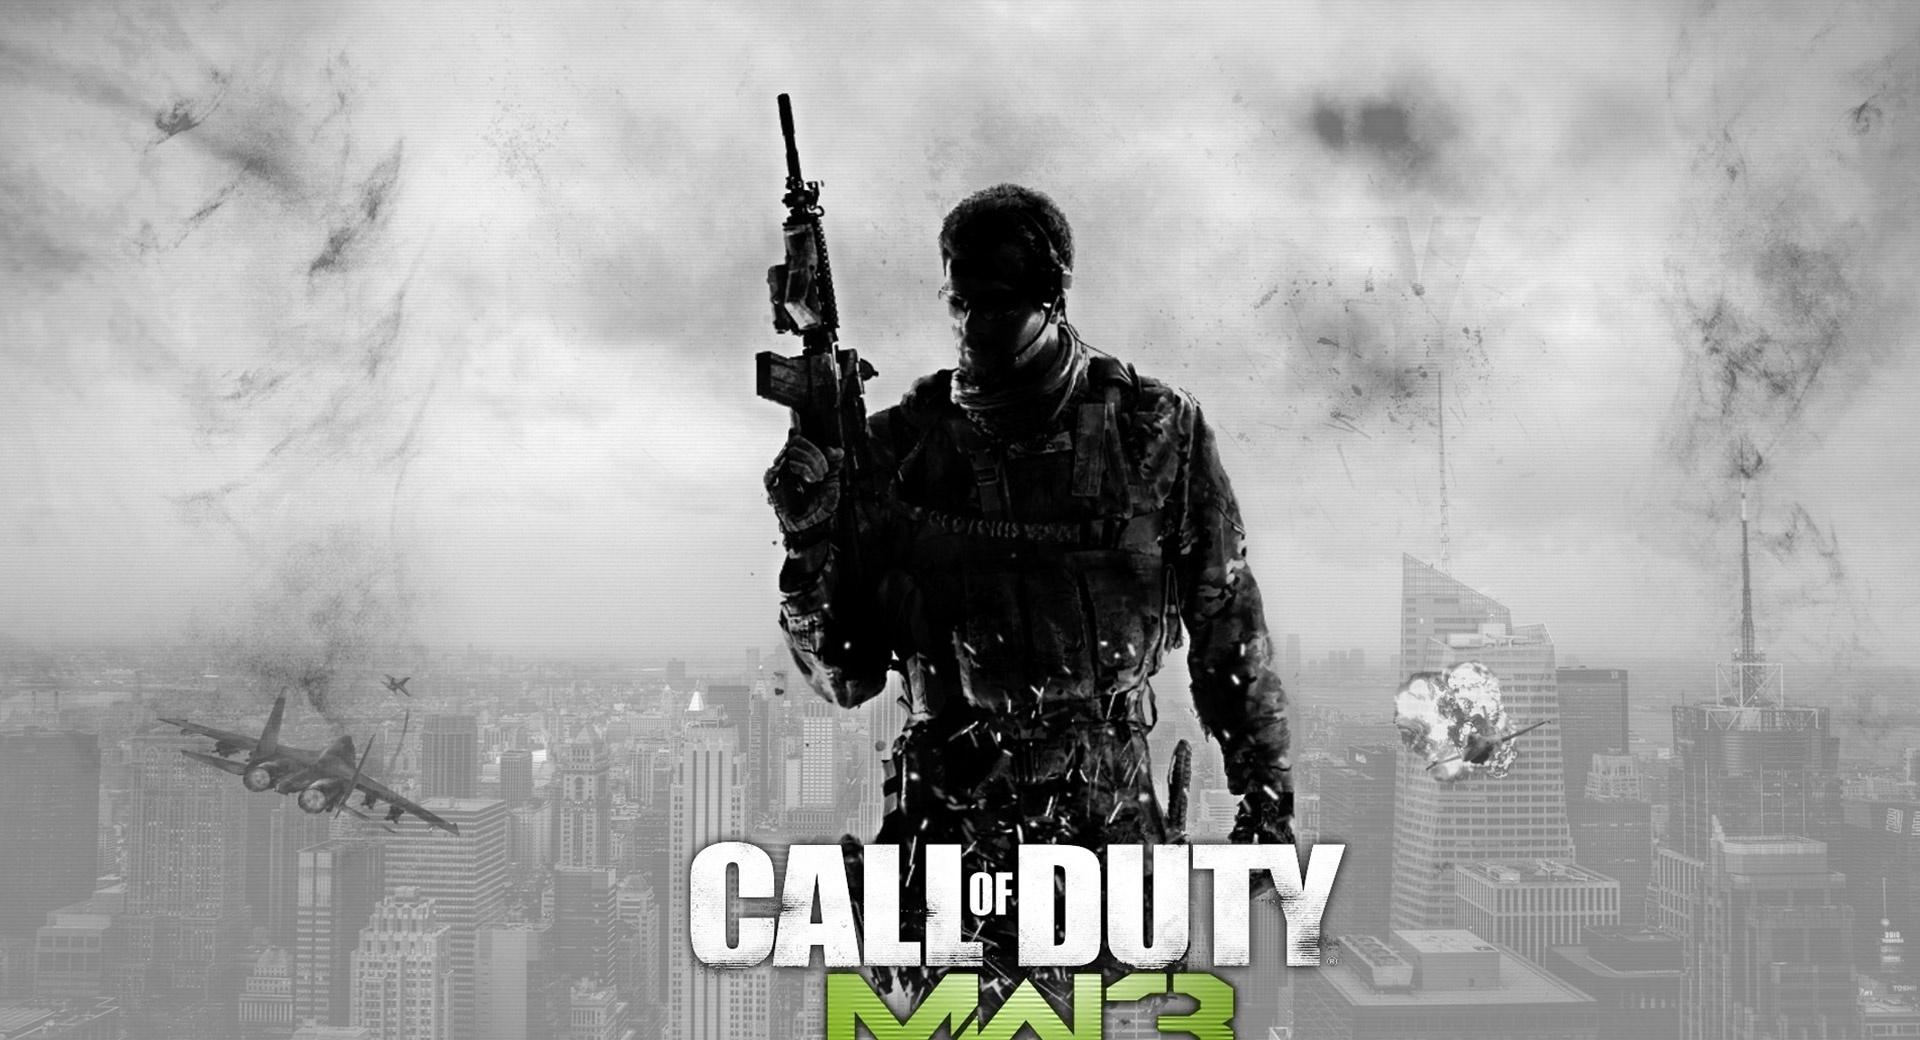 Call Of Duty Modern Warfare wallpapers HD quality